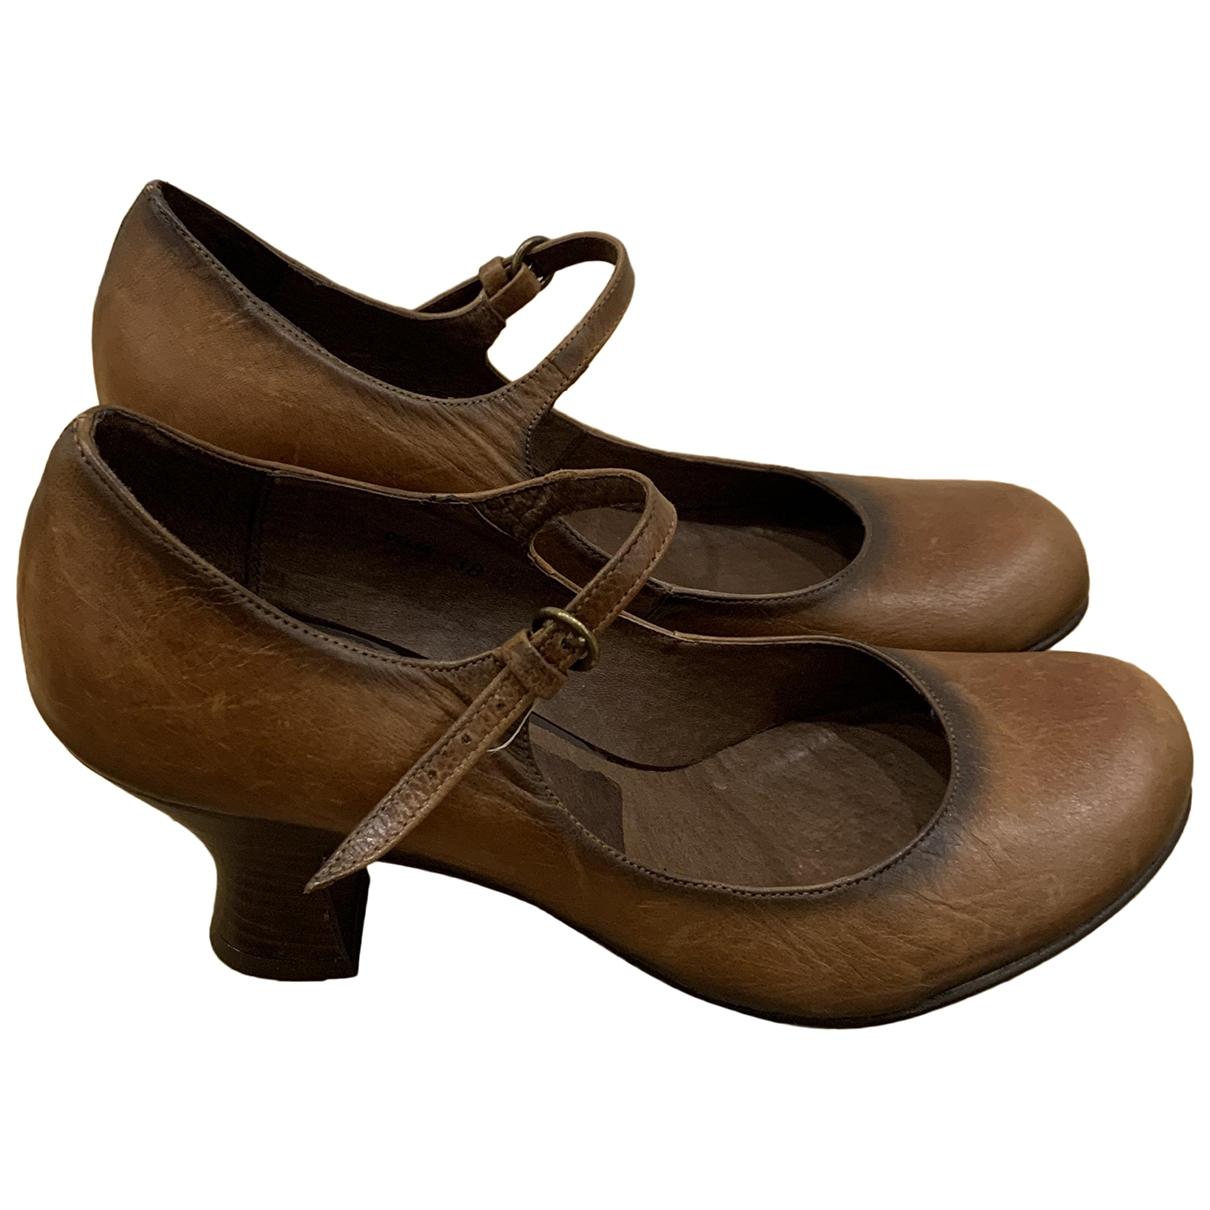 Kurt Geiger \N Brown Leather Heels for Women 5 UK